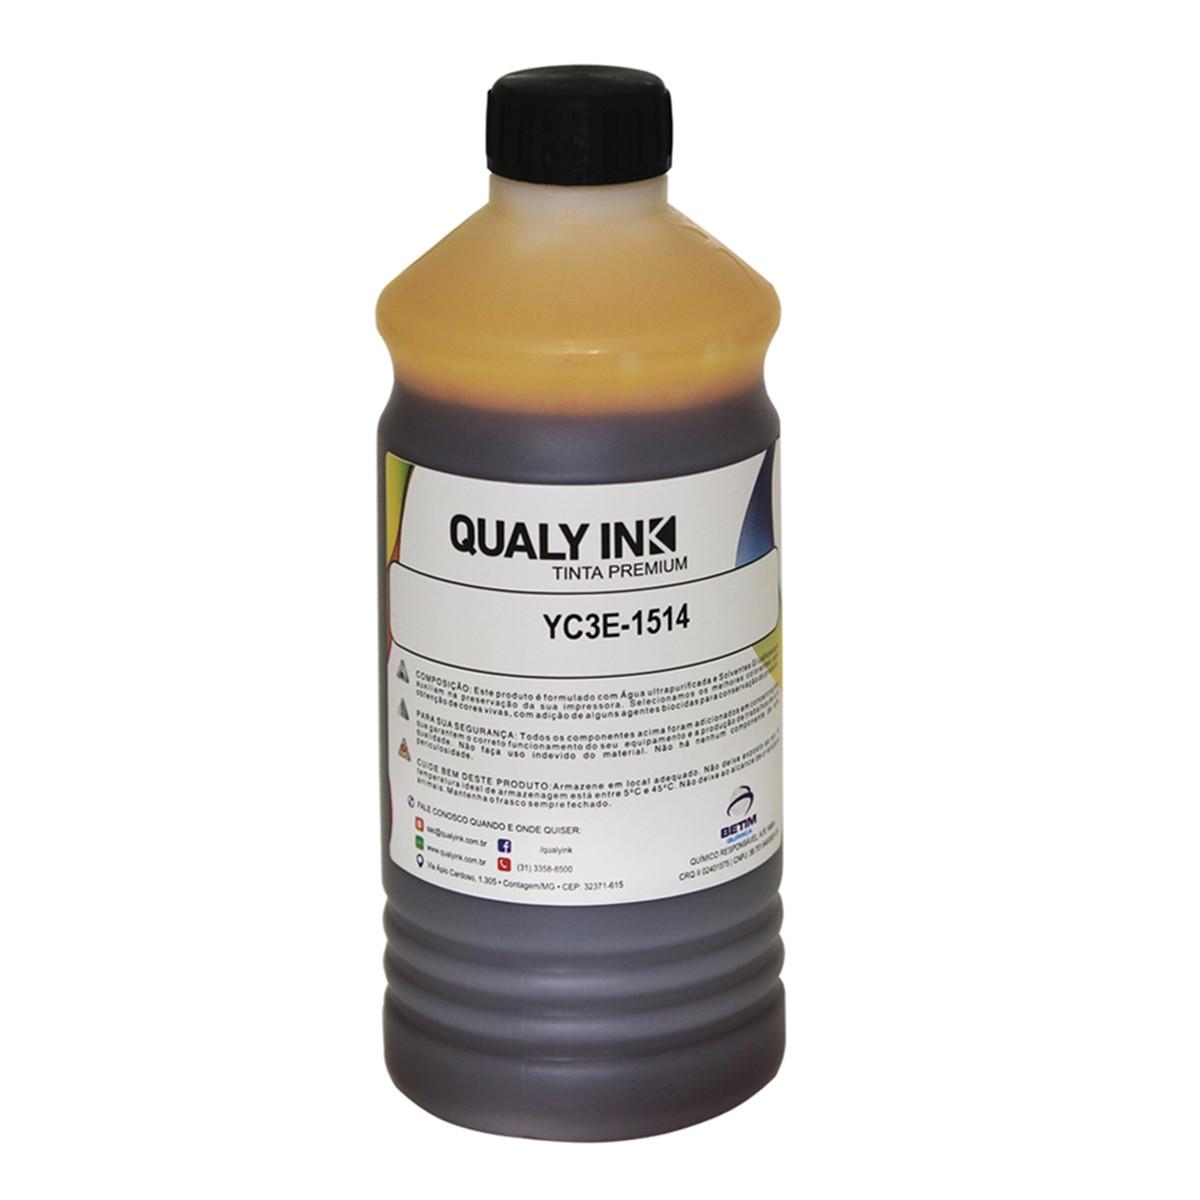 Tinta Epson T673420 Amarelo Corante | L800 L810 L805 L1800 | Qualy ink 1kg